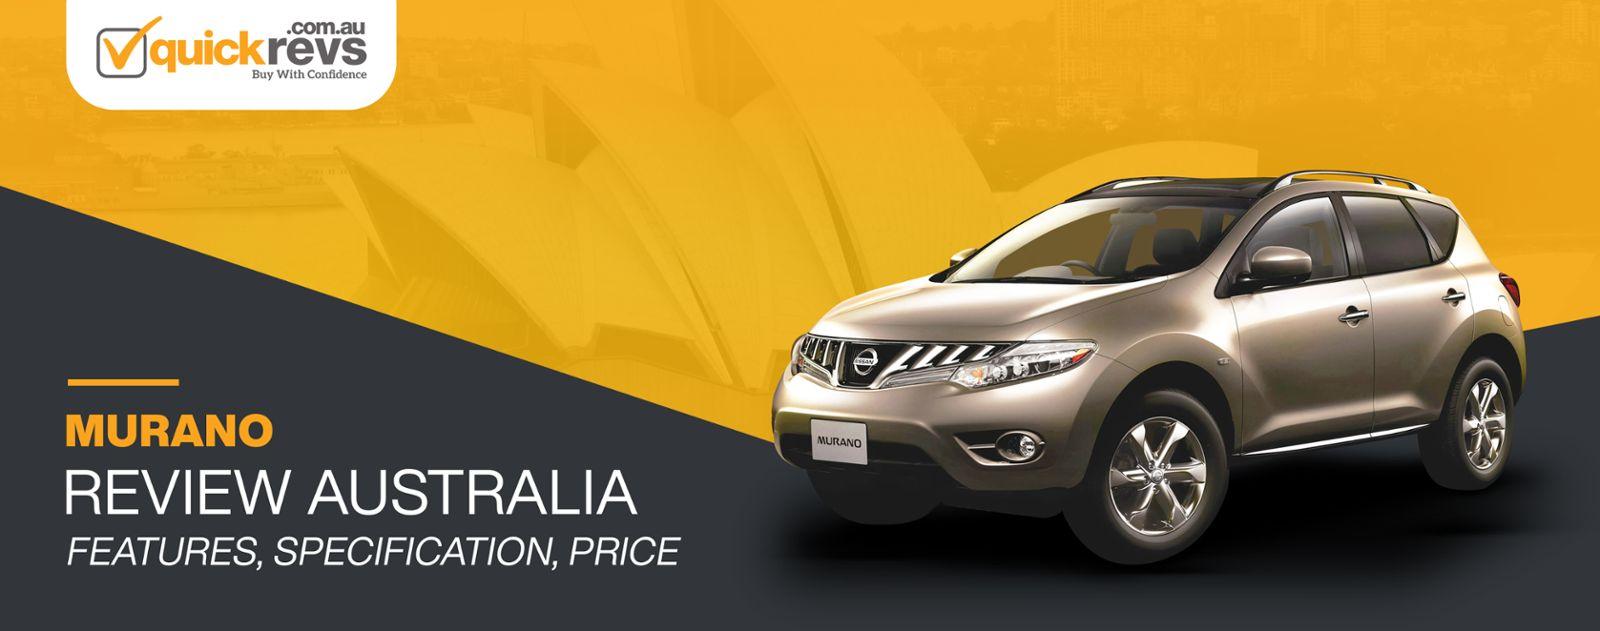 Nissan Murano Review Australia